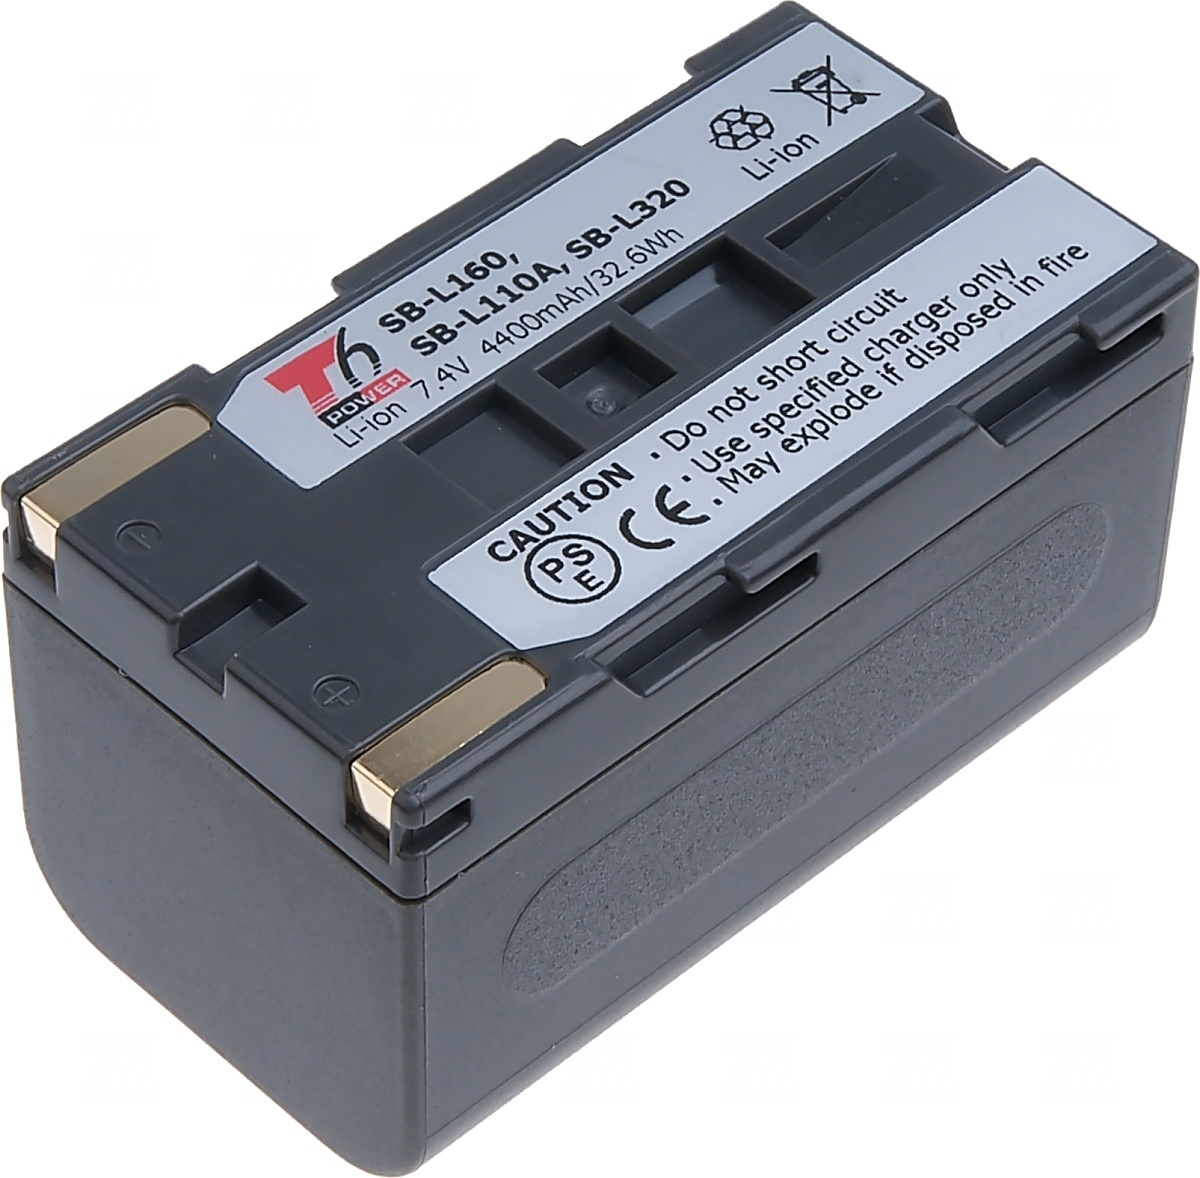 T6 power Baterie T6 power SB-L160, SB-L110A, SB-L320, šedá VCSA0